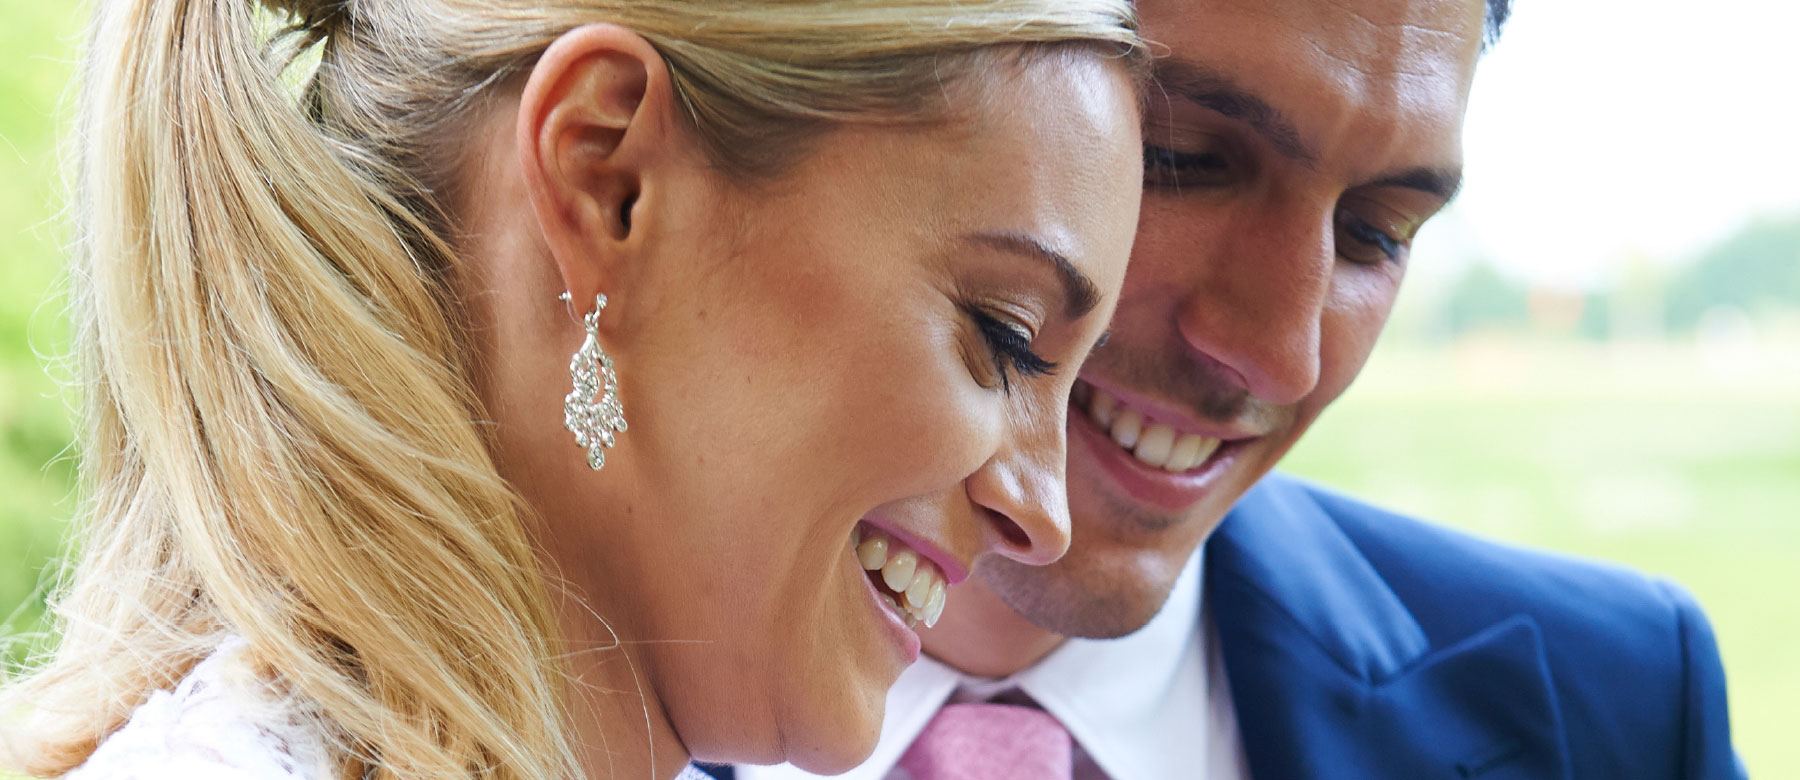 wedding organiser, Hampshire wedding planner, wedding planning pa, wedding planner Organiser